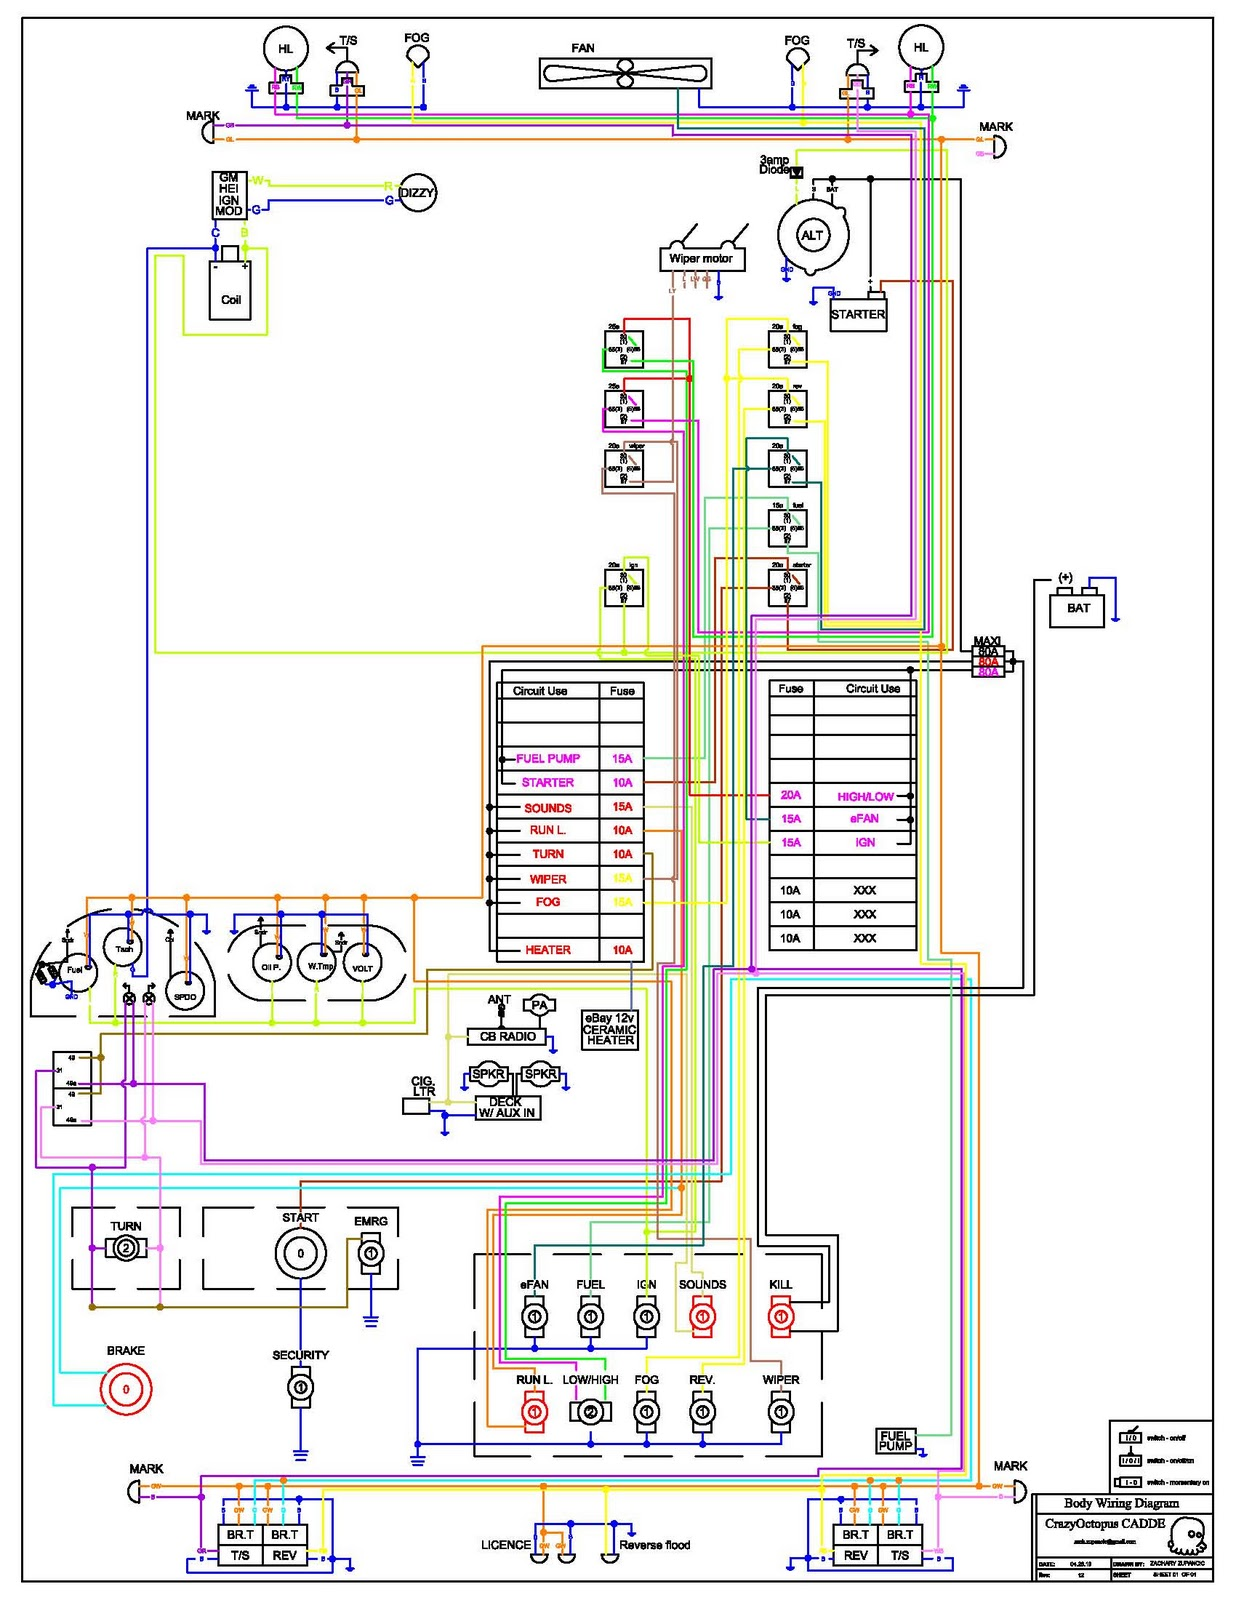 my 240z 240z wiring r12 my 240z datsun 240z wiring diagram at cita  [ 1236 x 1600 Pixel ]